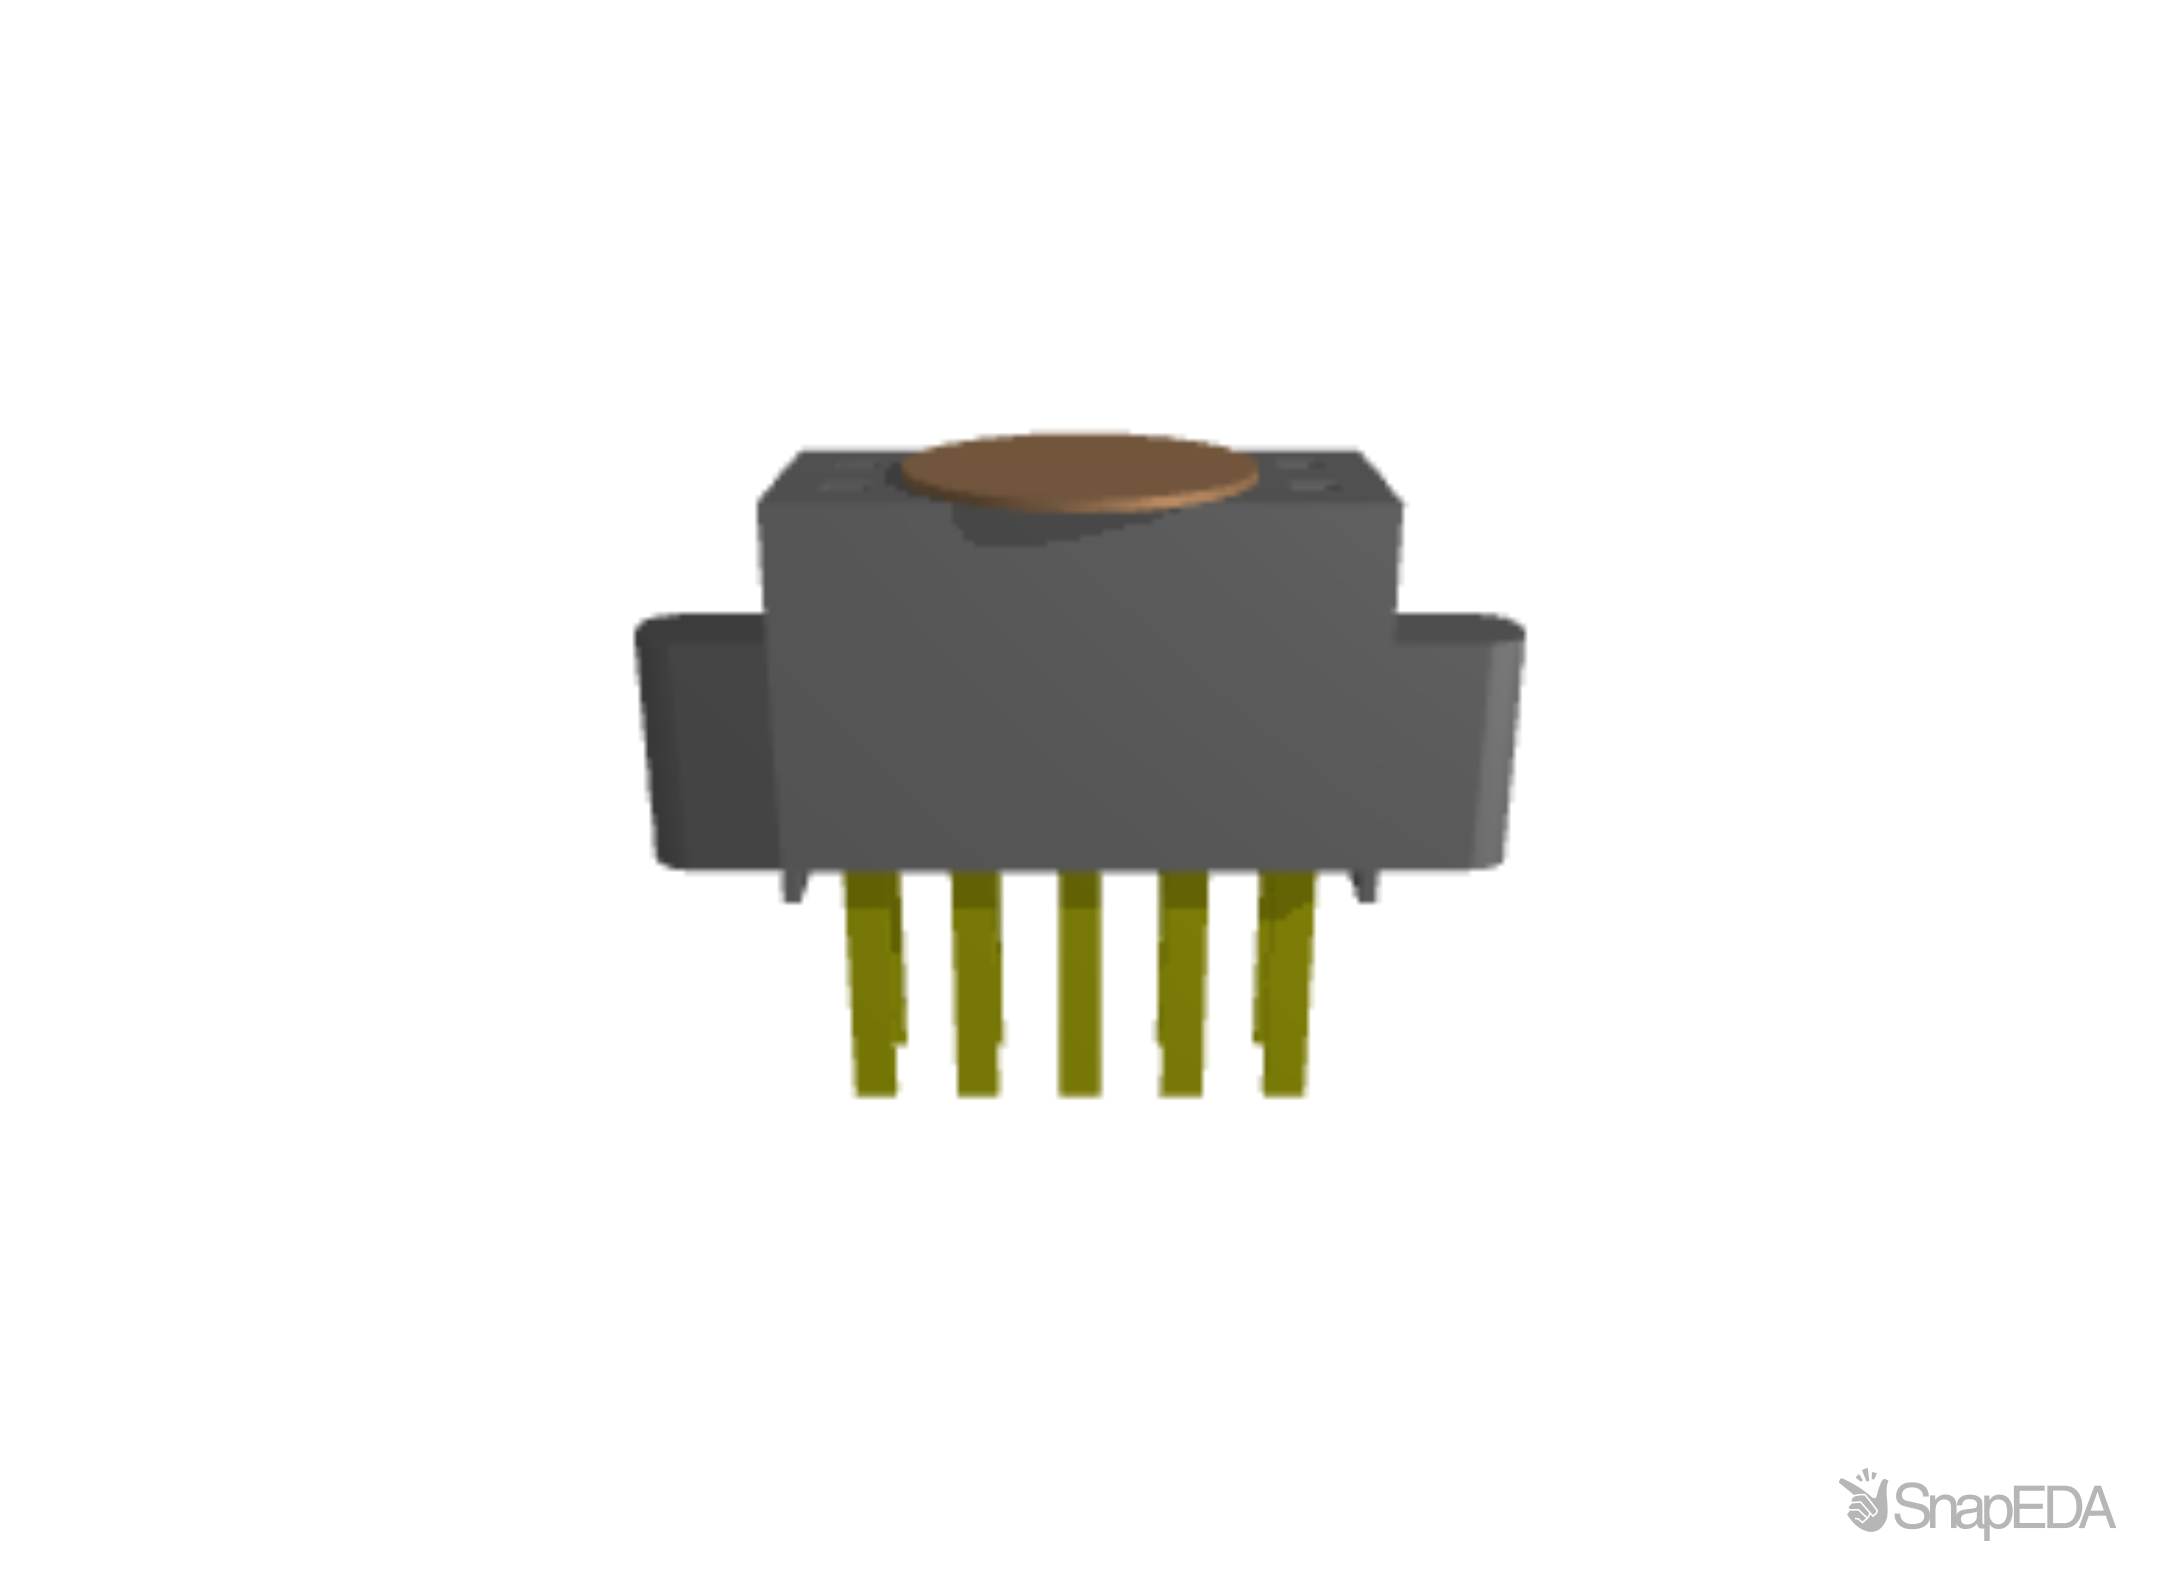 SFM-105-01-L-D-N-K-TR 3D Model